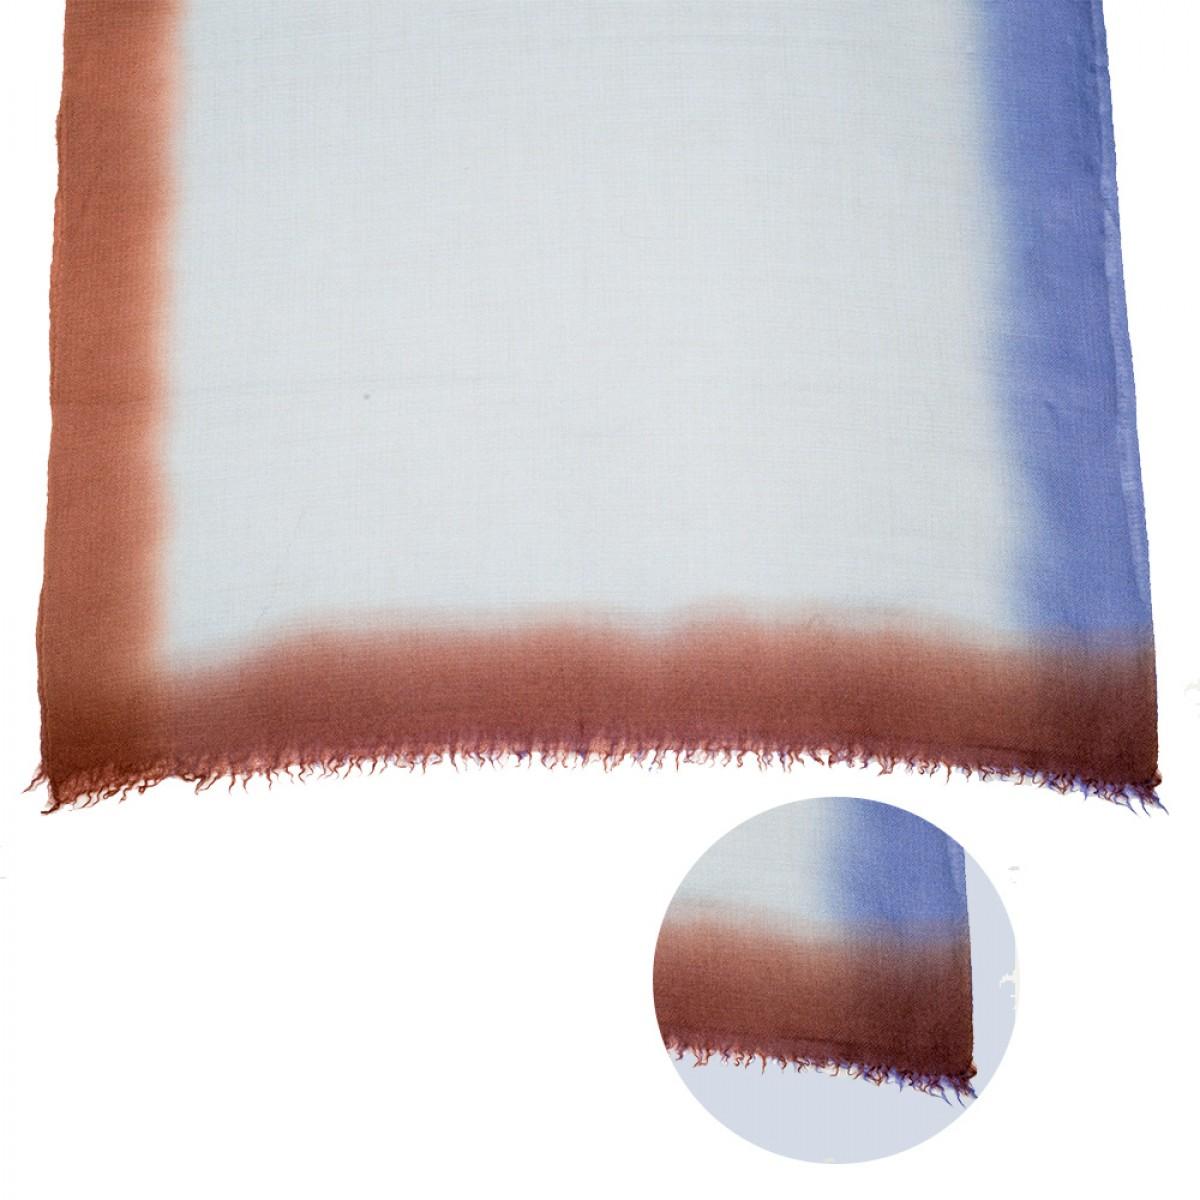 Ombre Pashmina Stole - Sky Blue & Brown